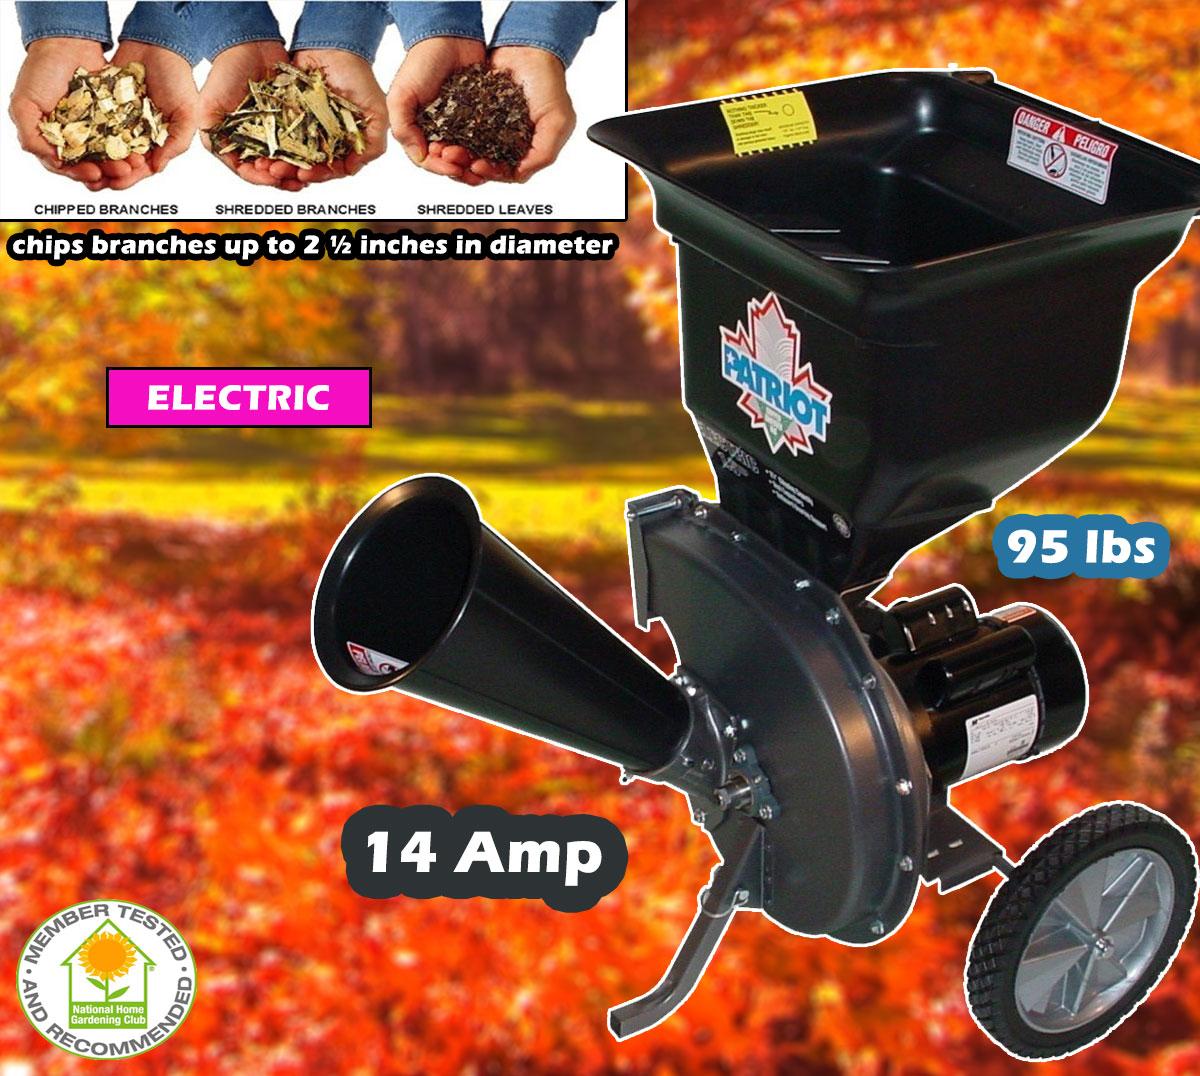 Patriot Products CSV-2515 Wood Chipper Leaf Shredder